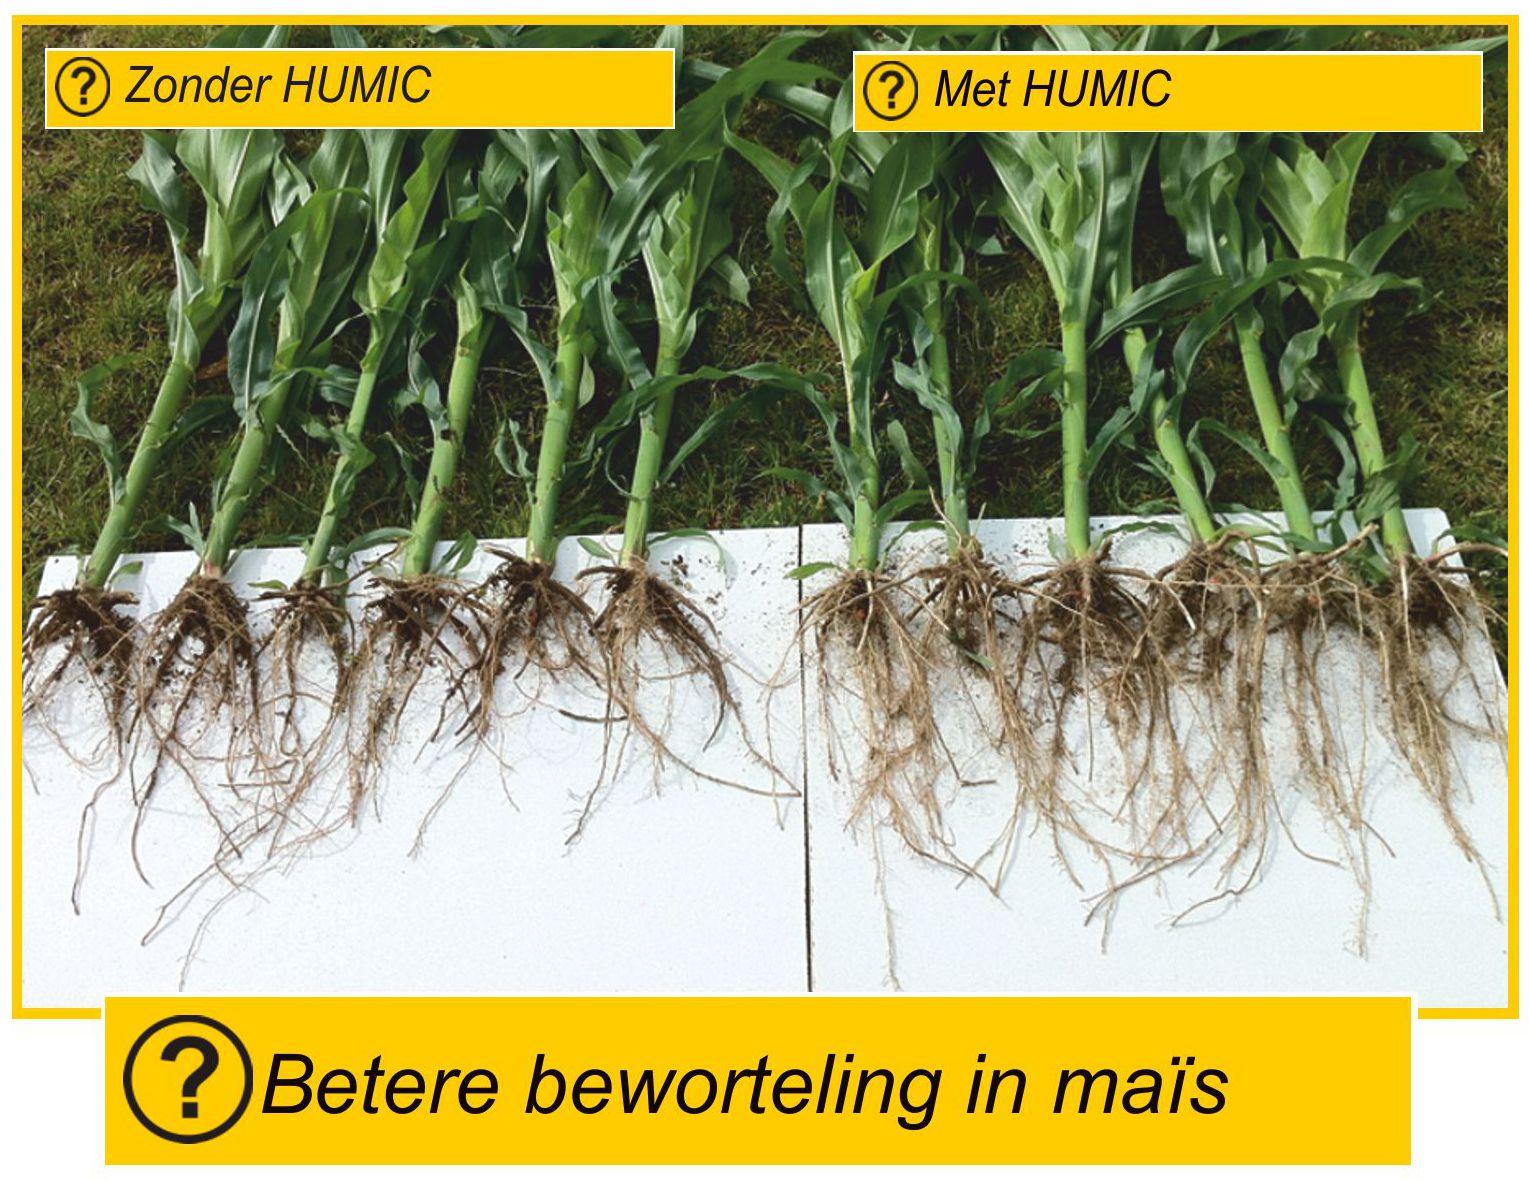 Wortelontwikkeling fosfaat mais Humuszuren Humic